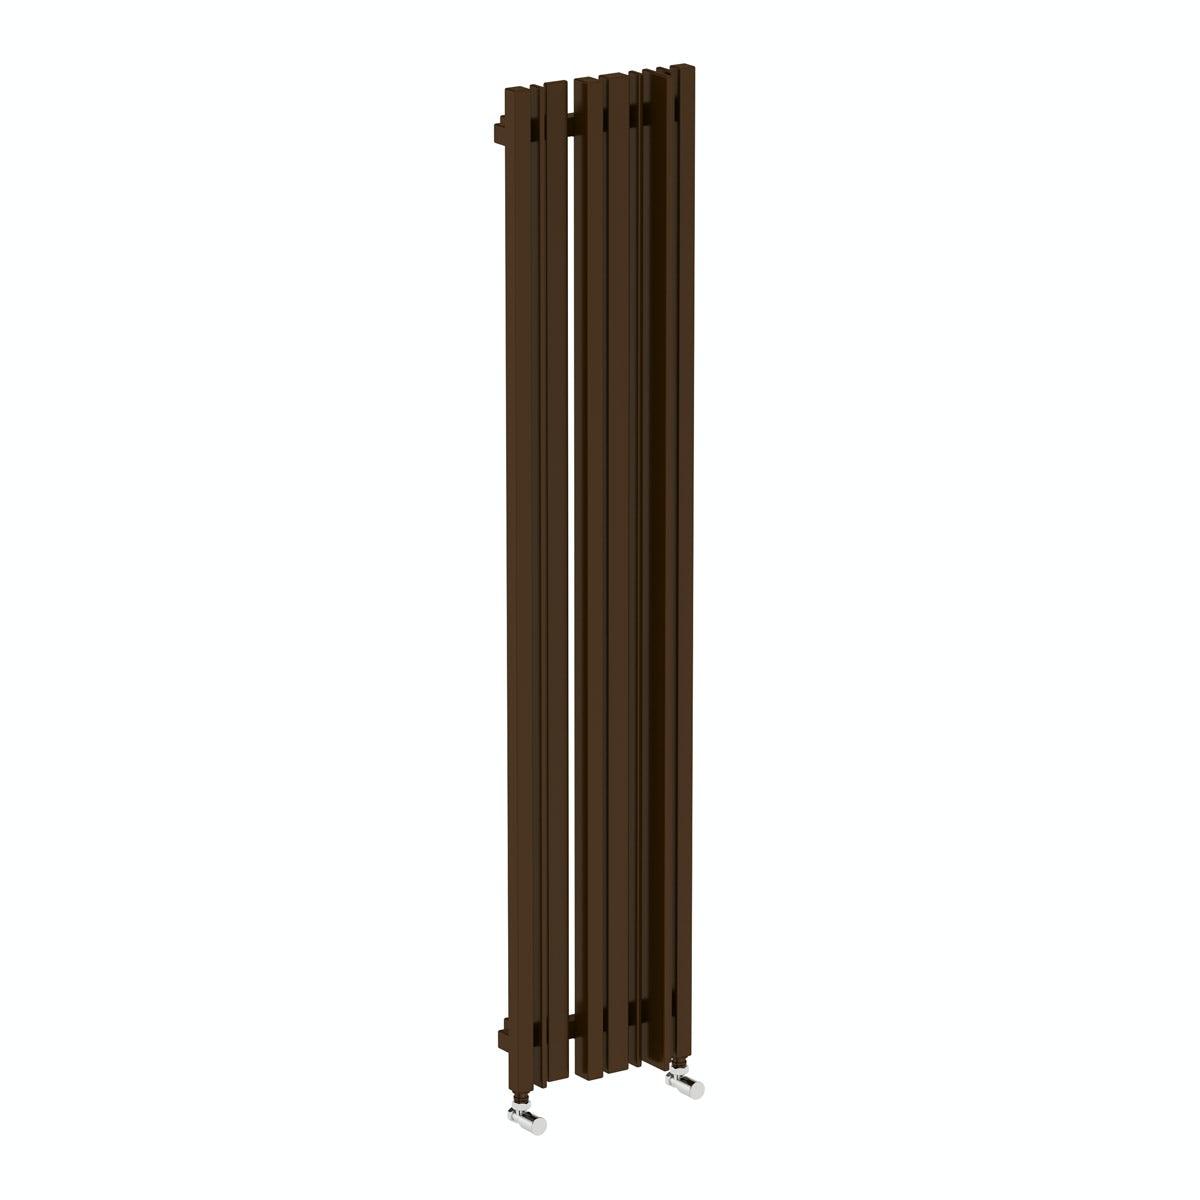 Sherwood terra brown vertical radiator 1600 x 330